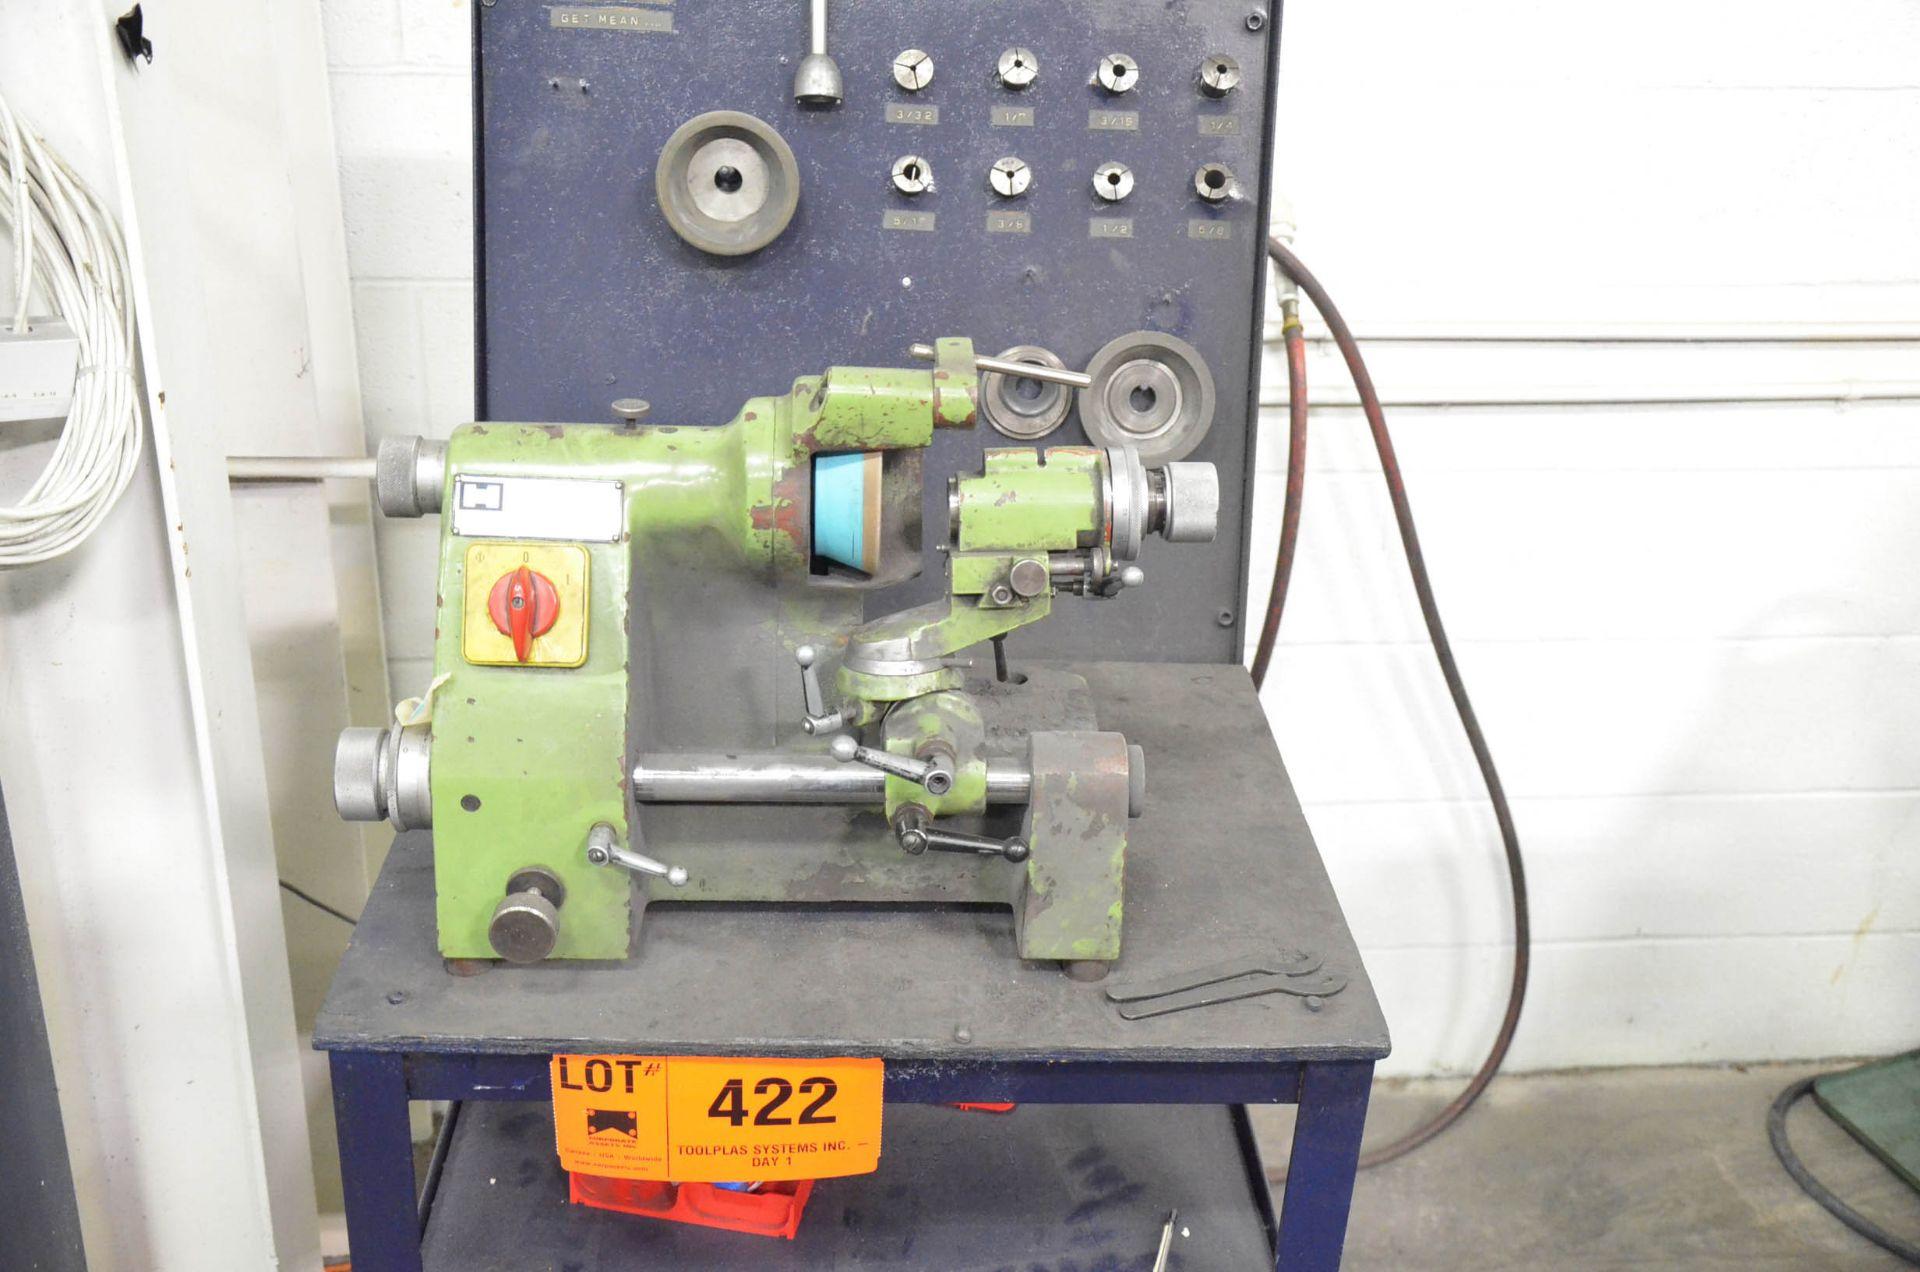 HEINMAN MACHINERY 02 UNIVERSAL TOOL AND CUTTER GRINDER, 110V/1PH/60HZ, S/N: 503475